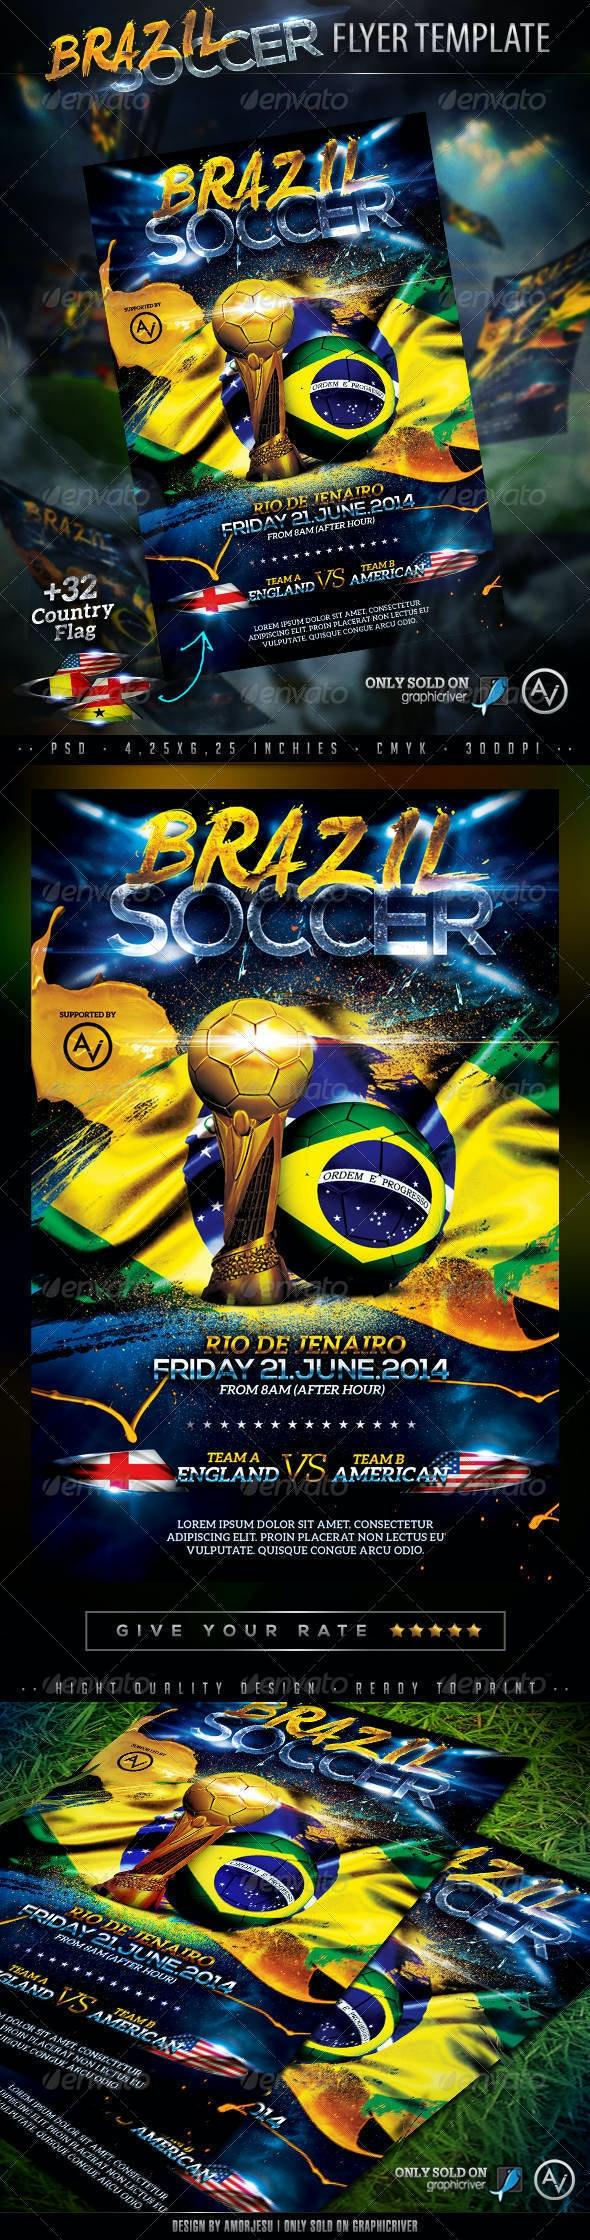 Brazil Soccer Flyer Template - Sports Events